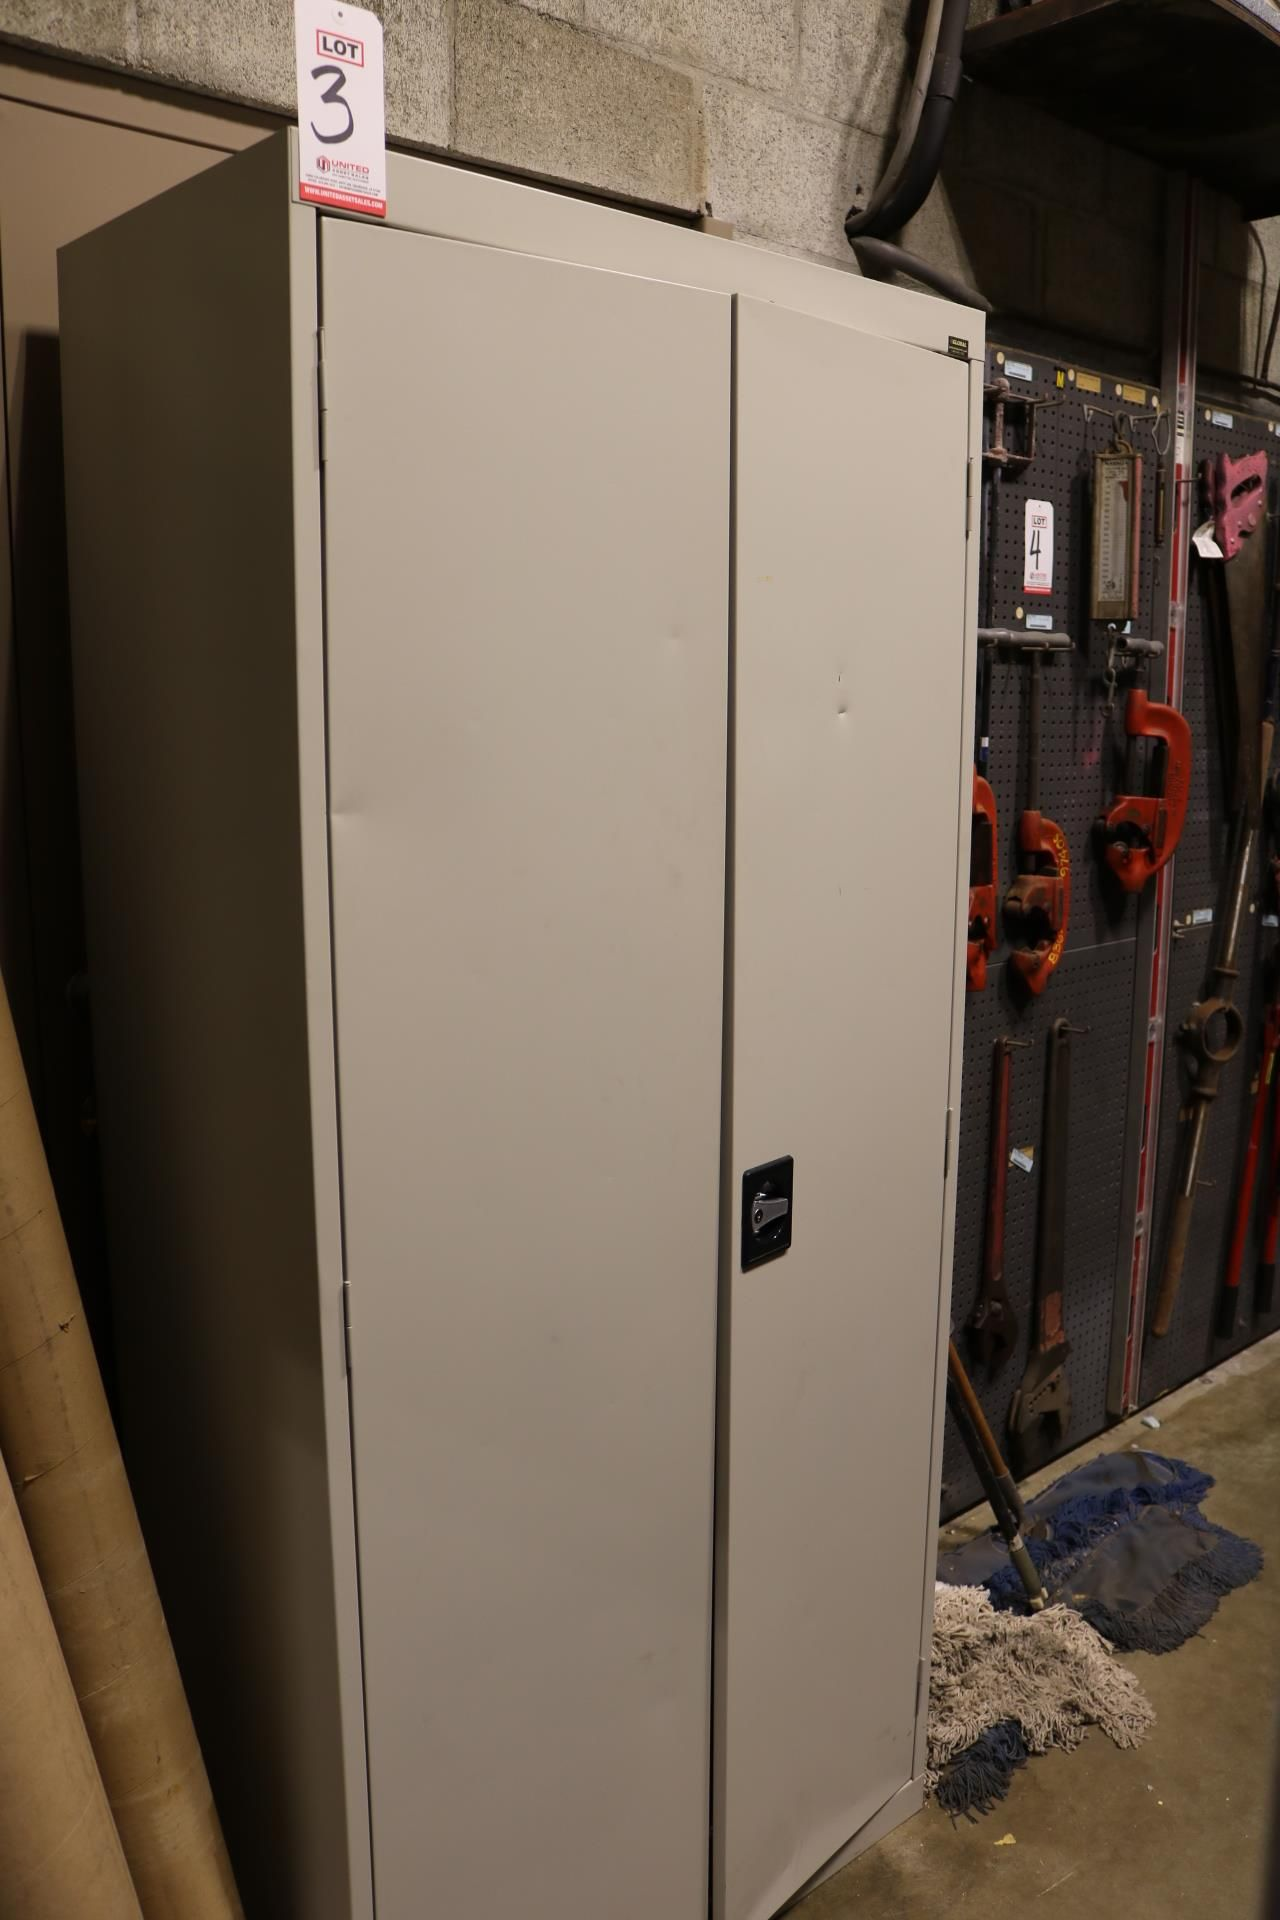 Lot 3 - 2-DOOR STORAGE CABINET W/ CONTENTS: SALISBURY PRO-WEAR ARC FLASH PROTECTION GARMENTS, FACE SHIELDS